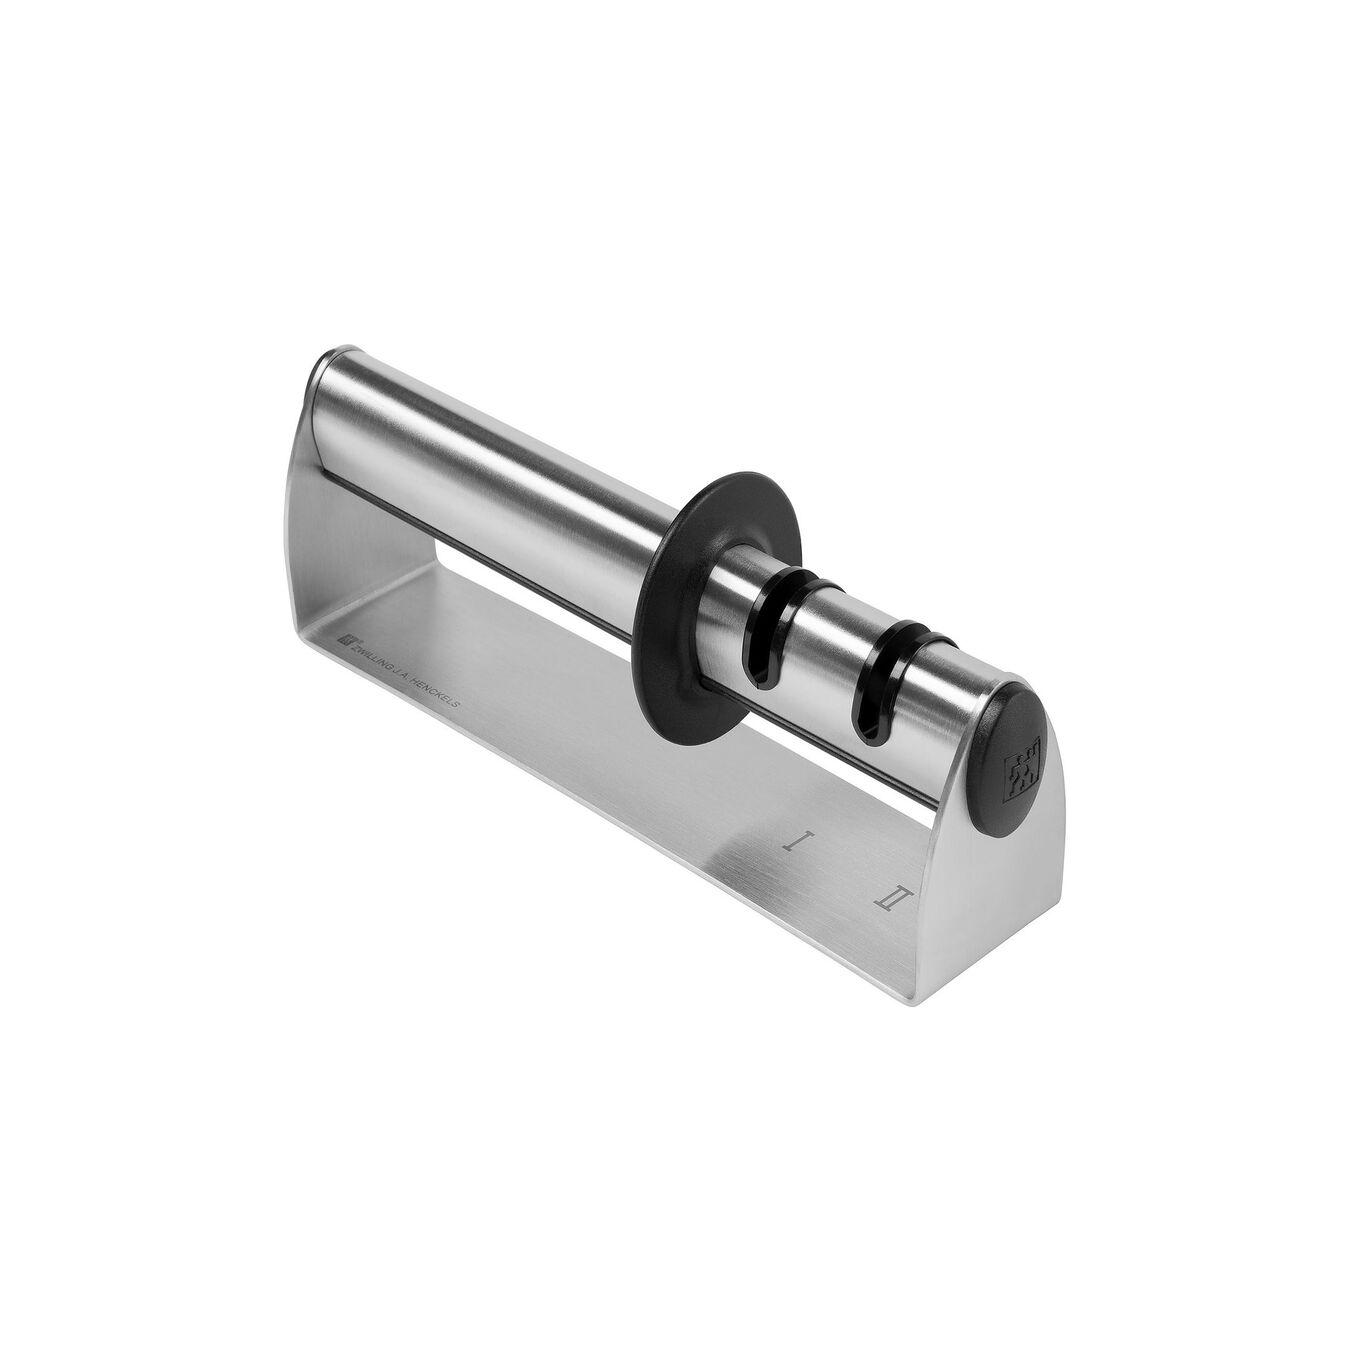 TWINSHARP Select Silber, Edelstahl,,large 4